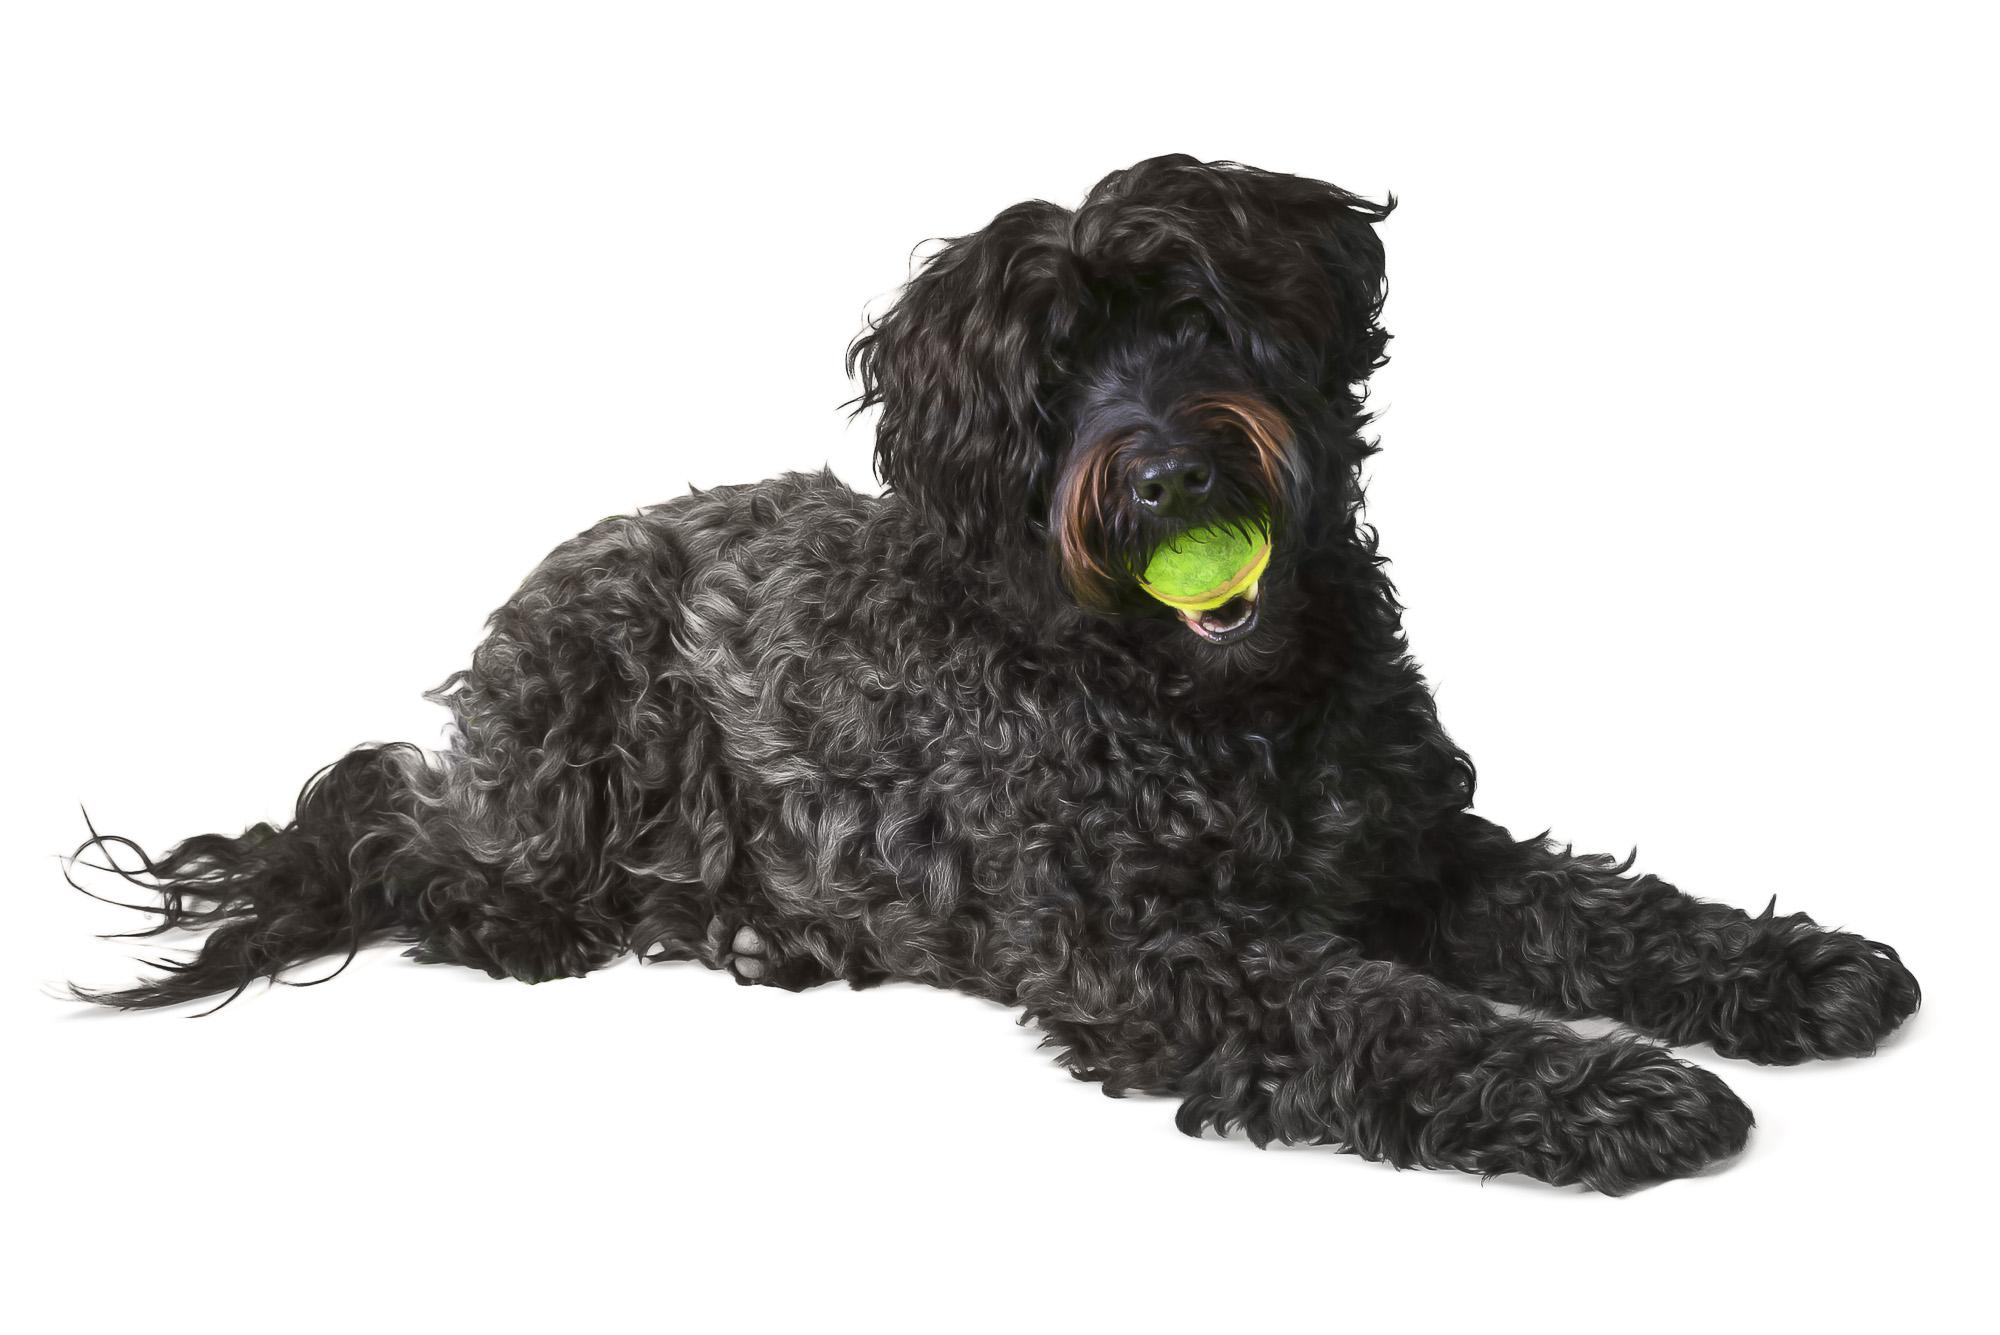 LupinBay-0115-Wheaten-Terrier-Tibetan-Terrier-Dog-Pet-Photography-0360.jpg